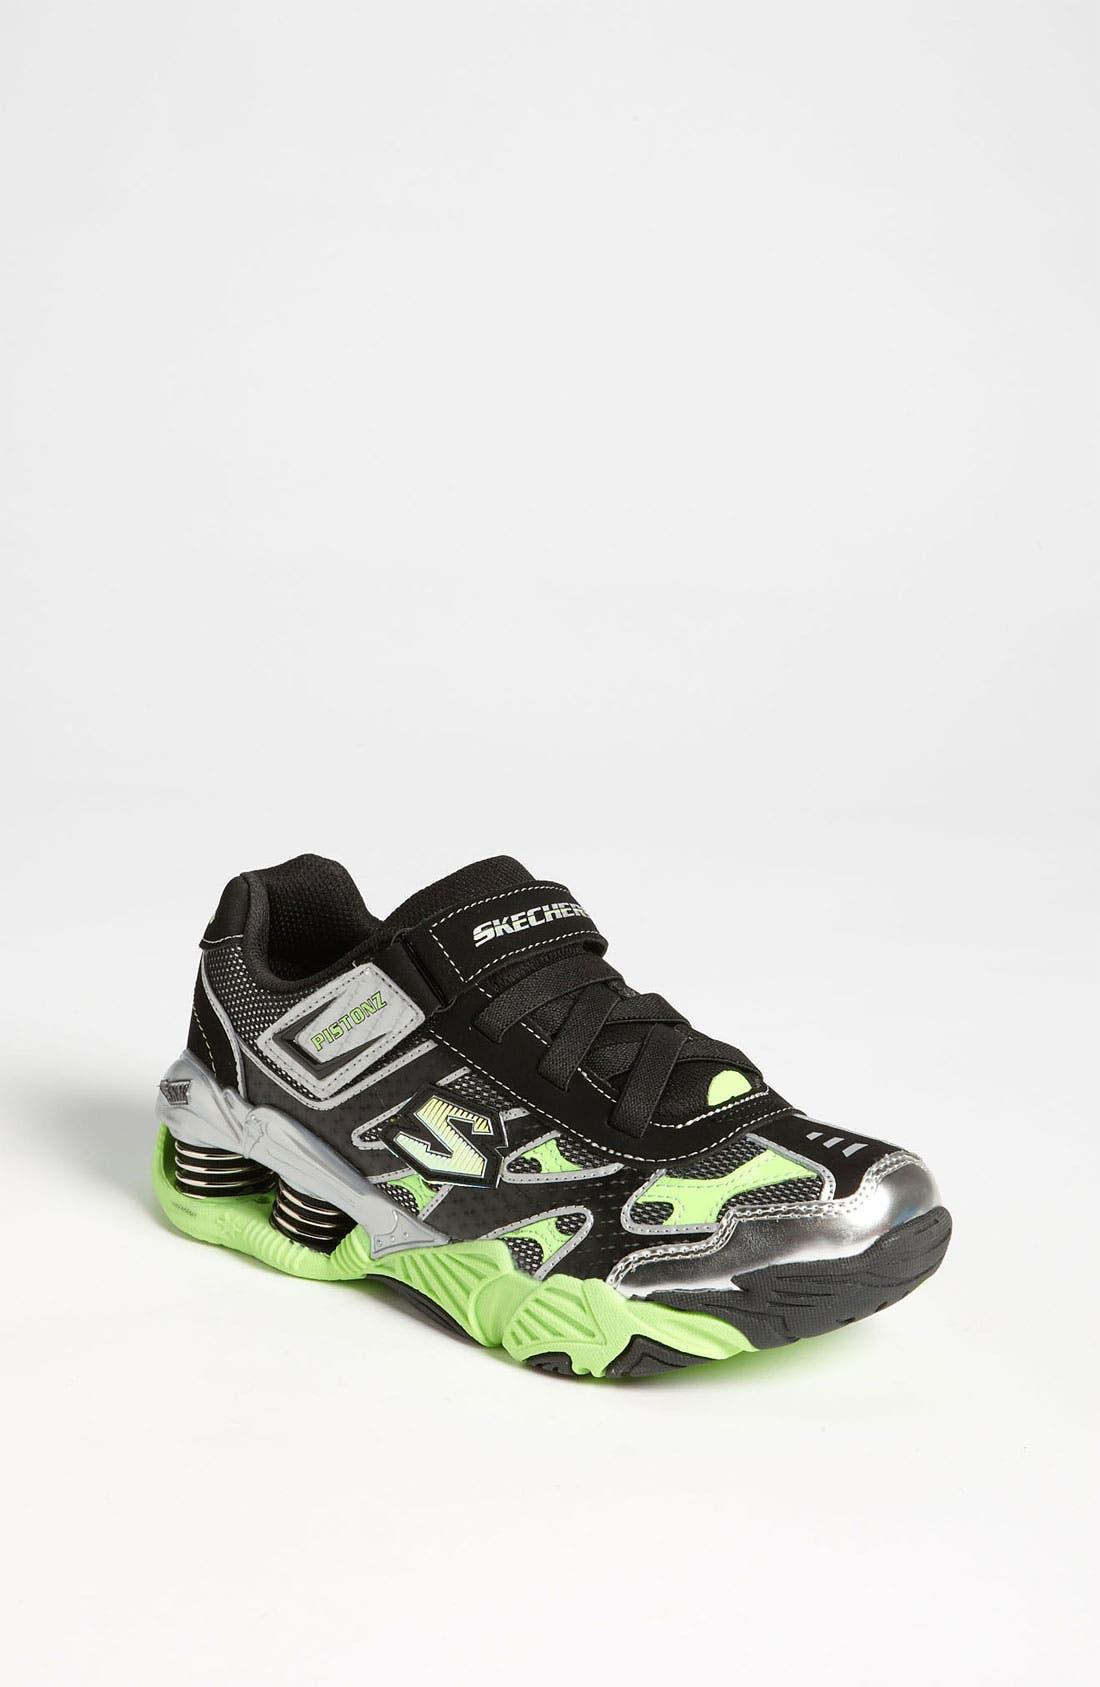 Alternate Image 1 Selected - SKECHERS 'Pistonz' Sneaker (Toddler, Little Kid & Big Kid)